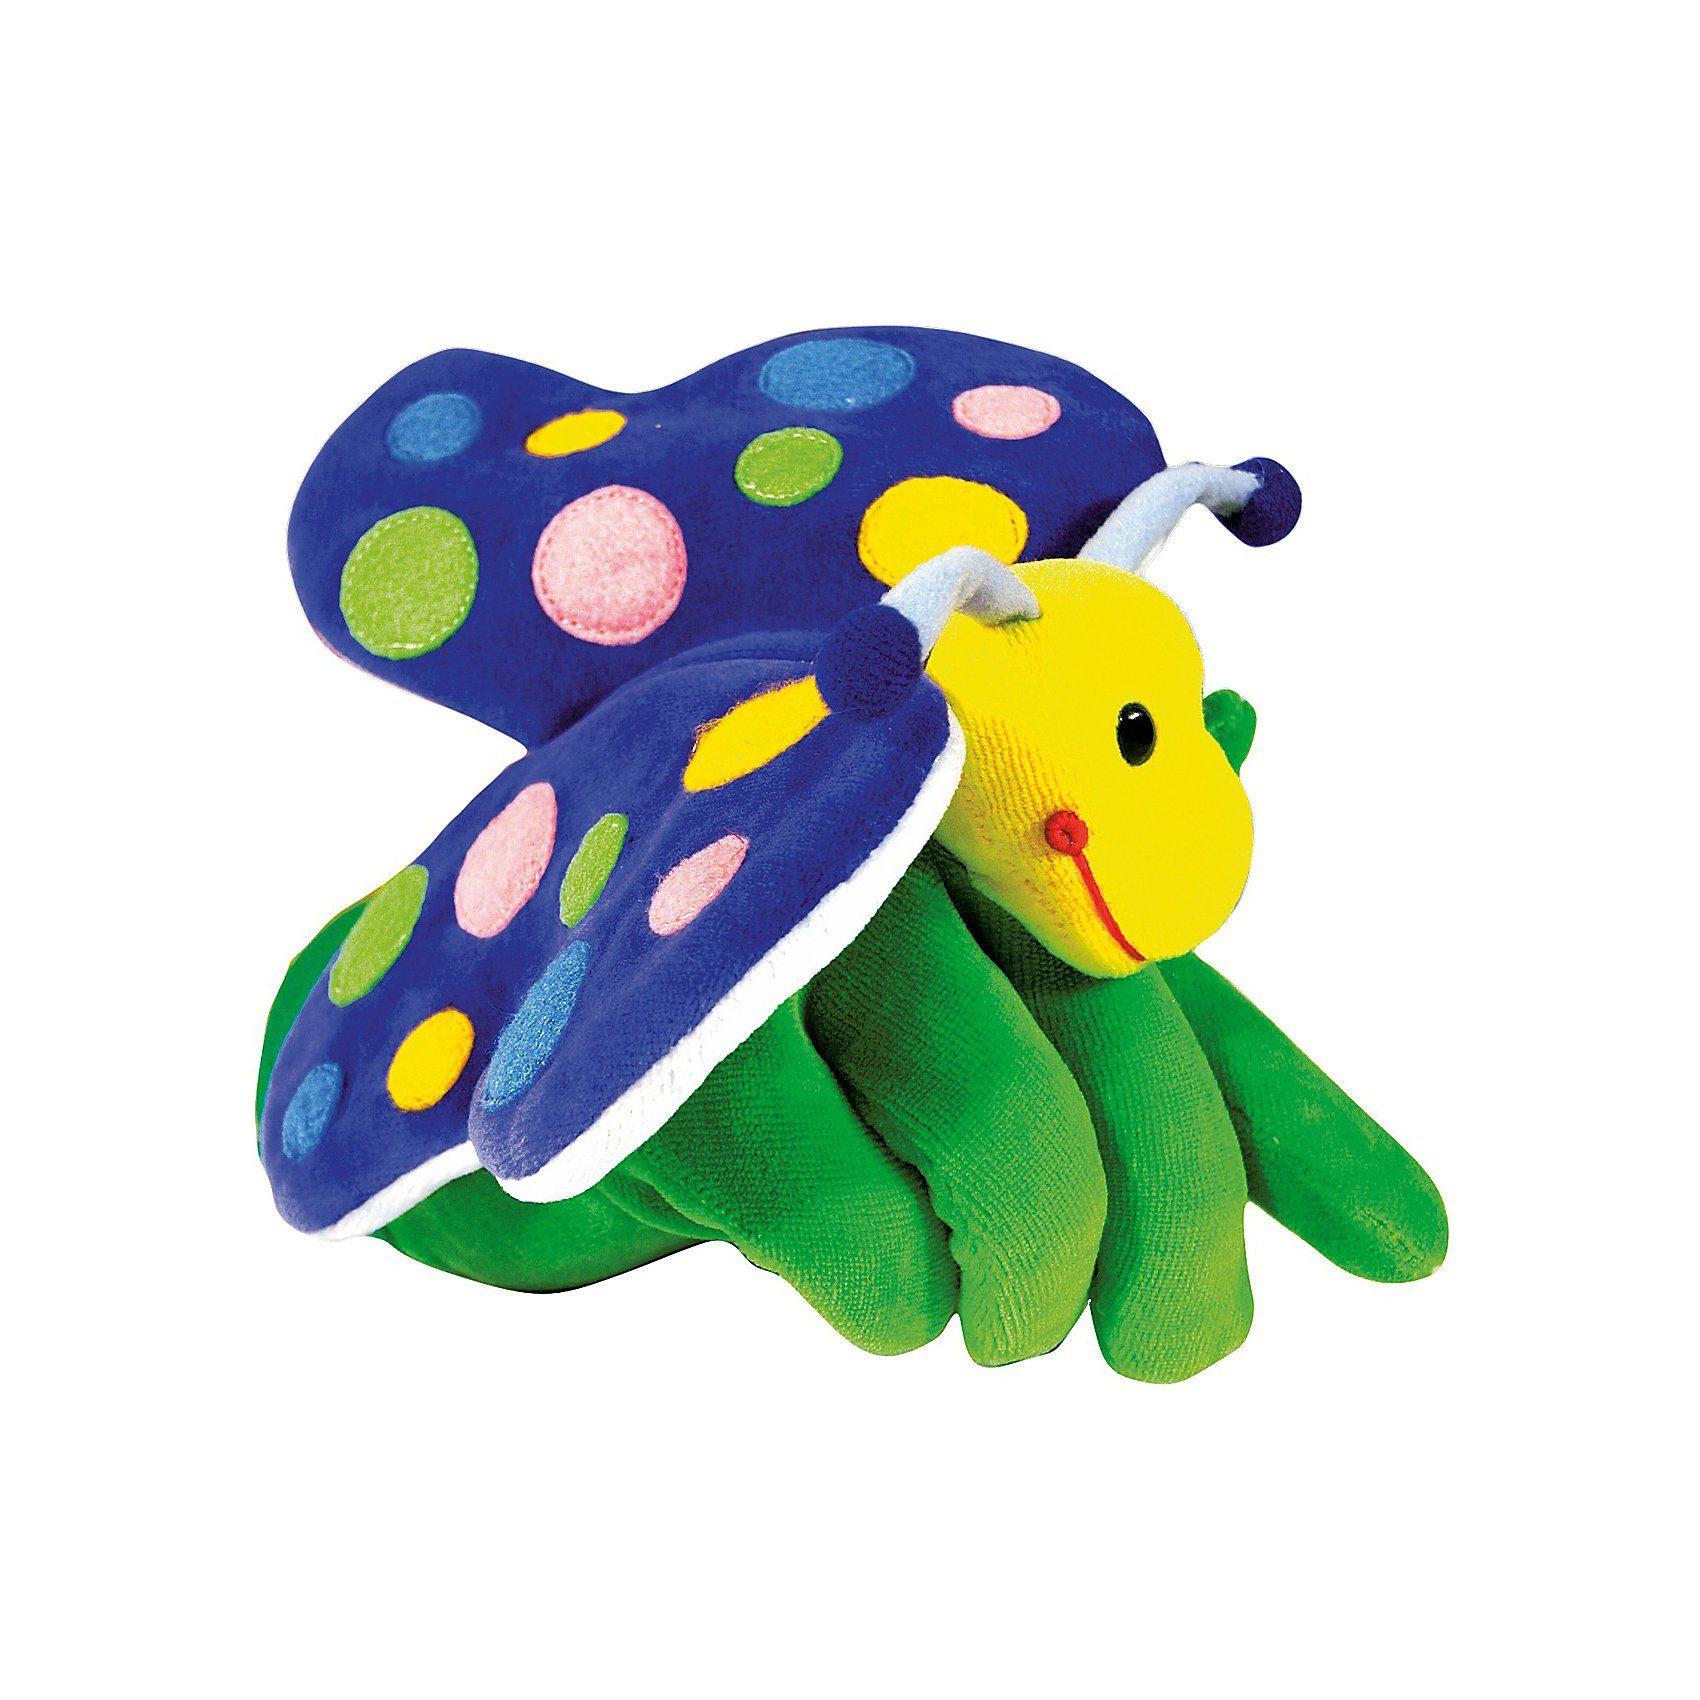 beleduc Handpuppe Schmetterling, 22 cm